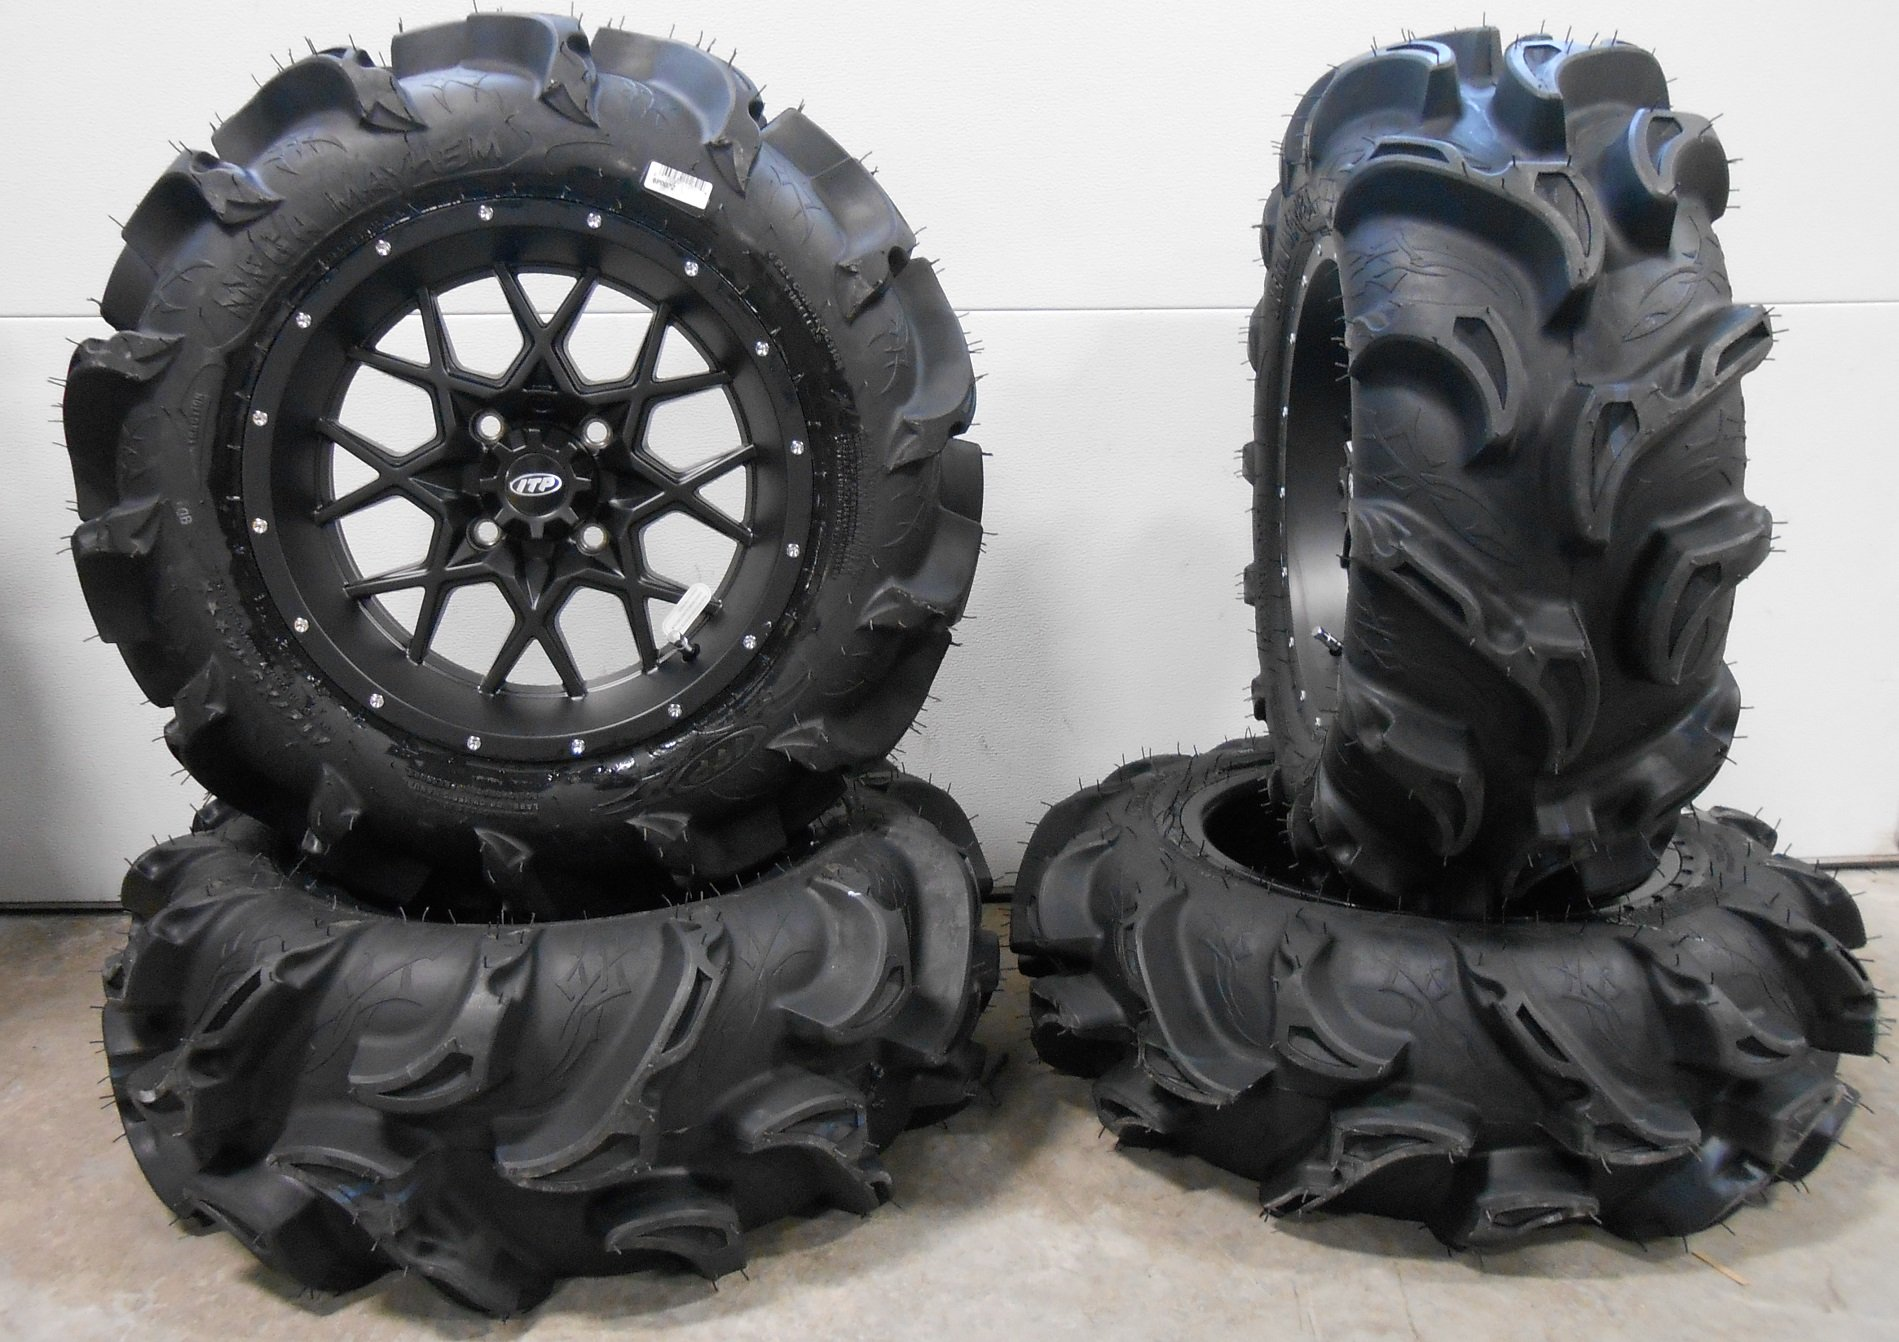 Bundle - 9 Items: ITP Hurricane 14'' Wheels Black 27'' Mega Mayhem Tires [4x110 Bolt Pattern 10mmx1.25 Lug Kit]